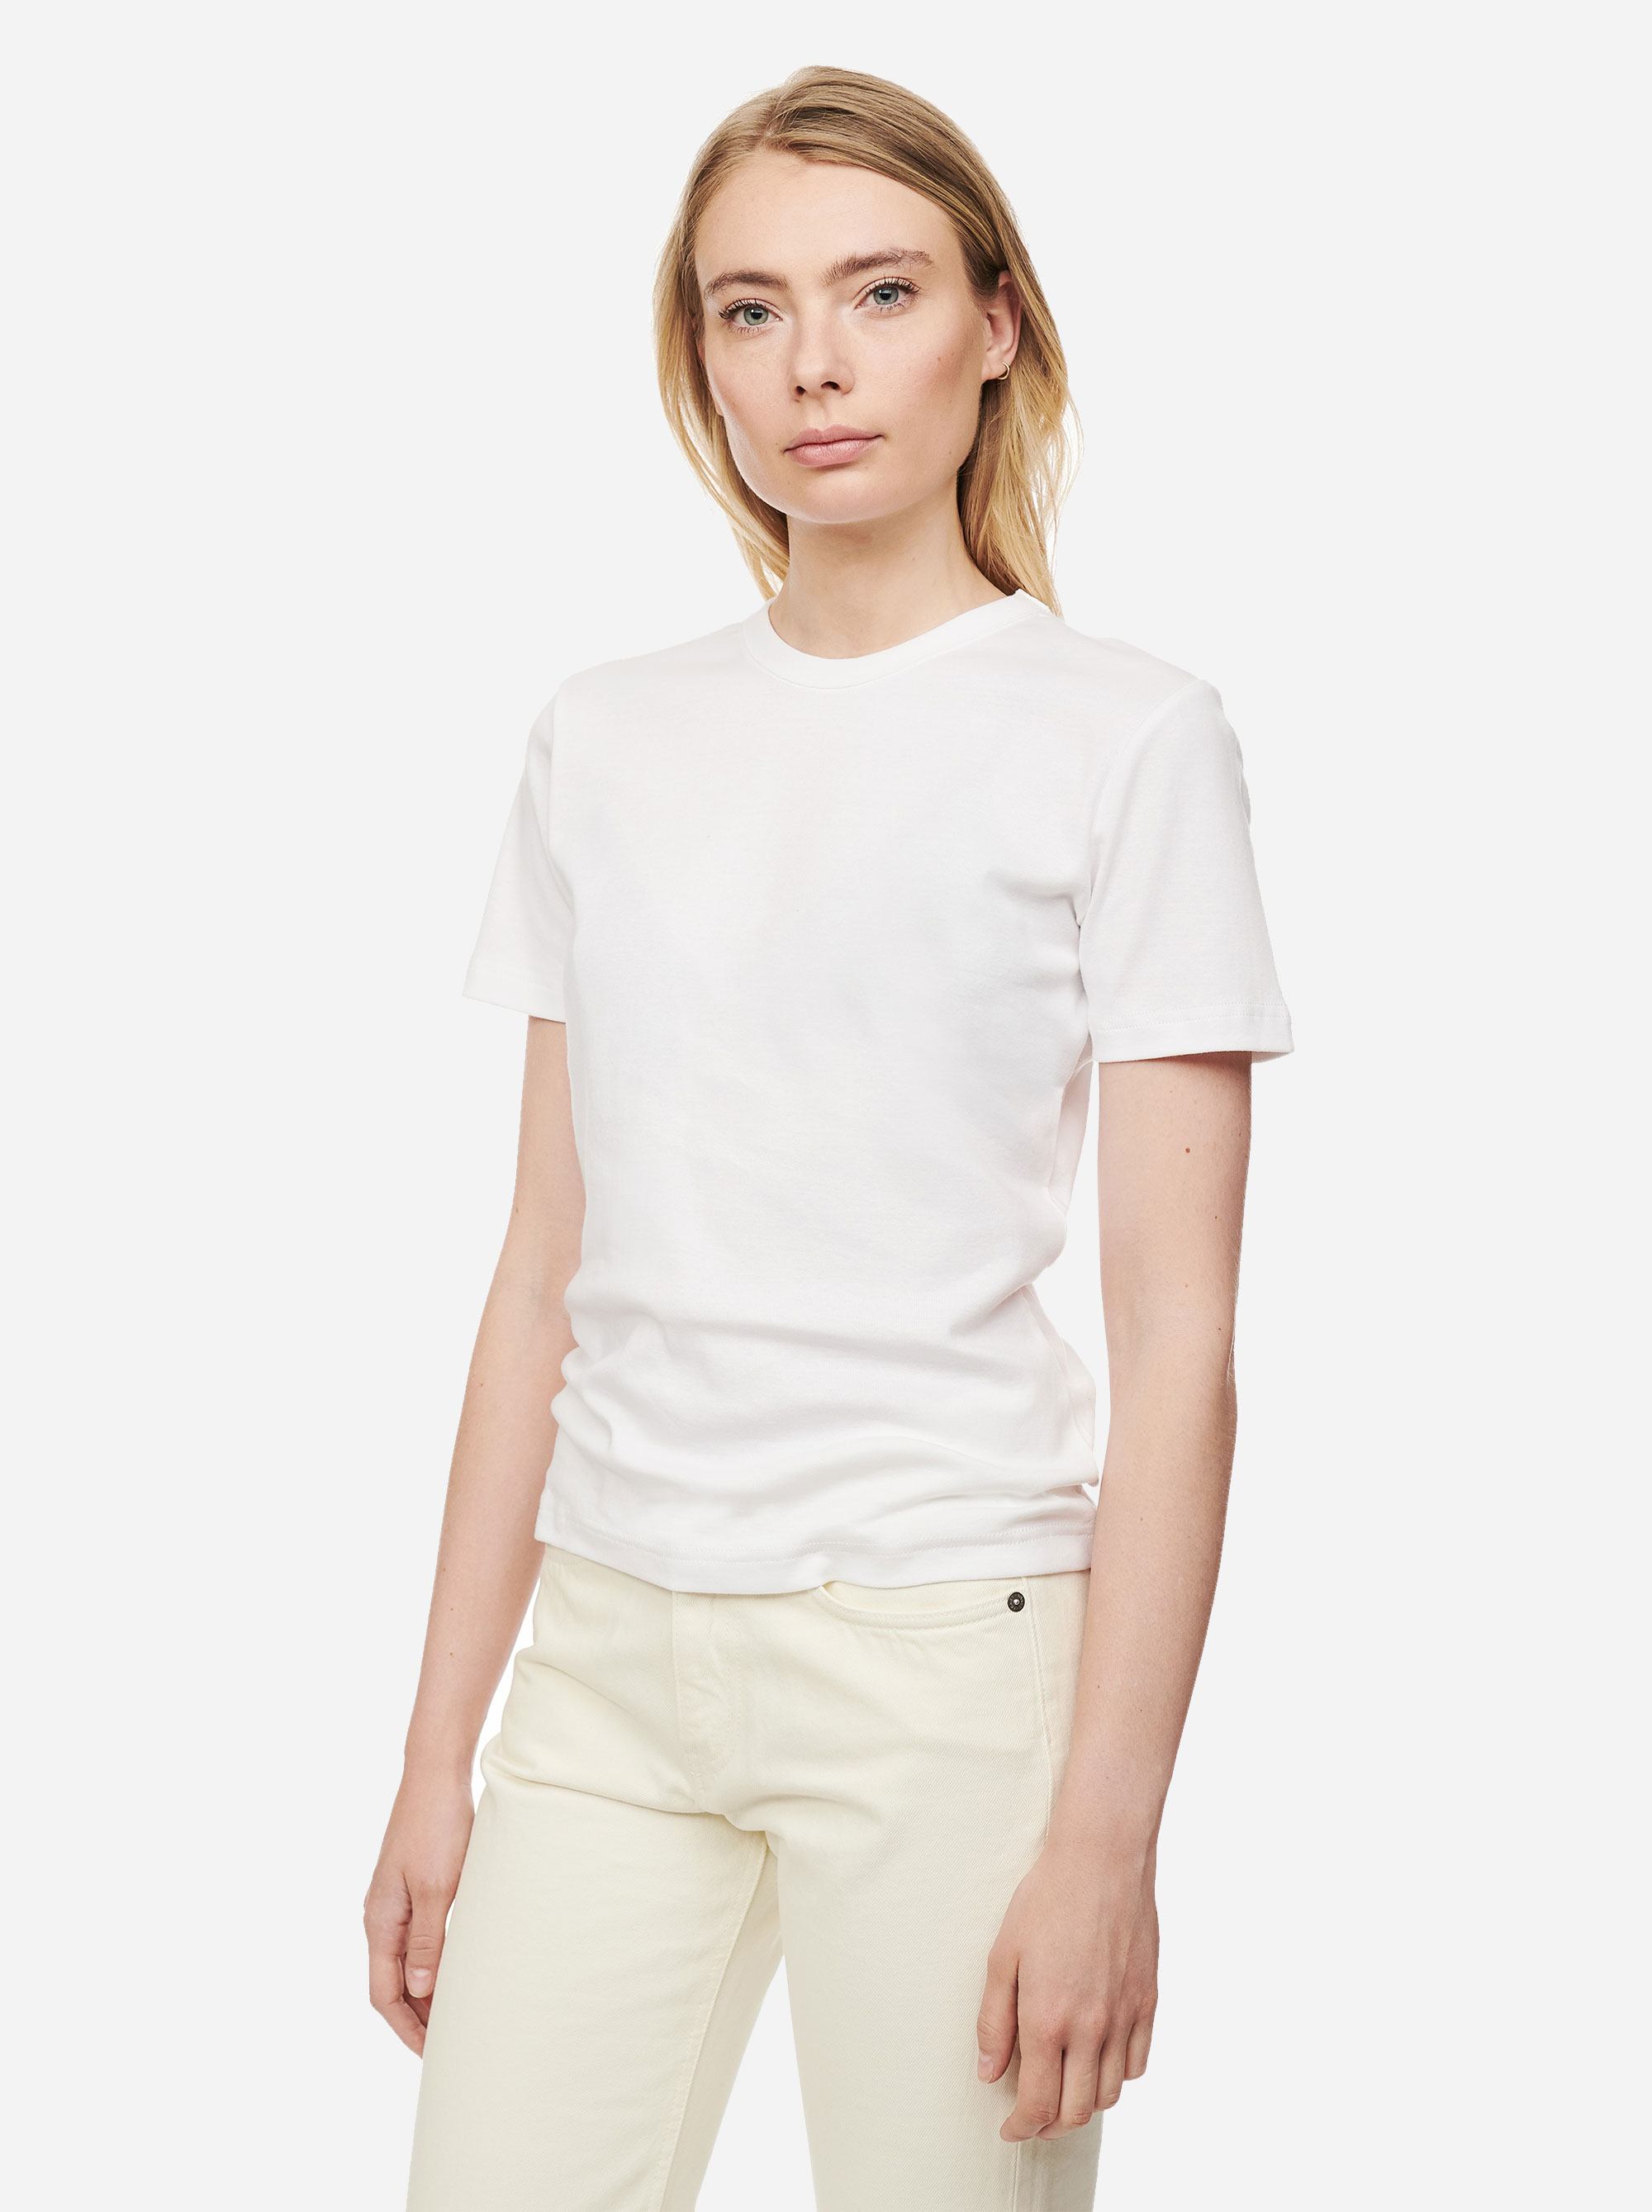 Teym - The T-Shirt - Women - White - 1